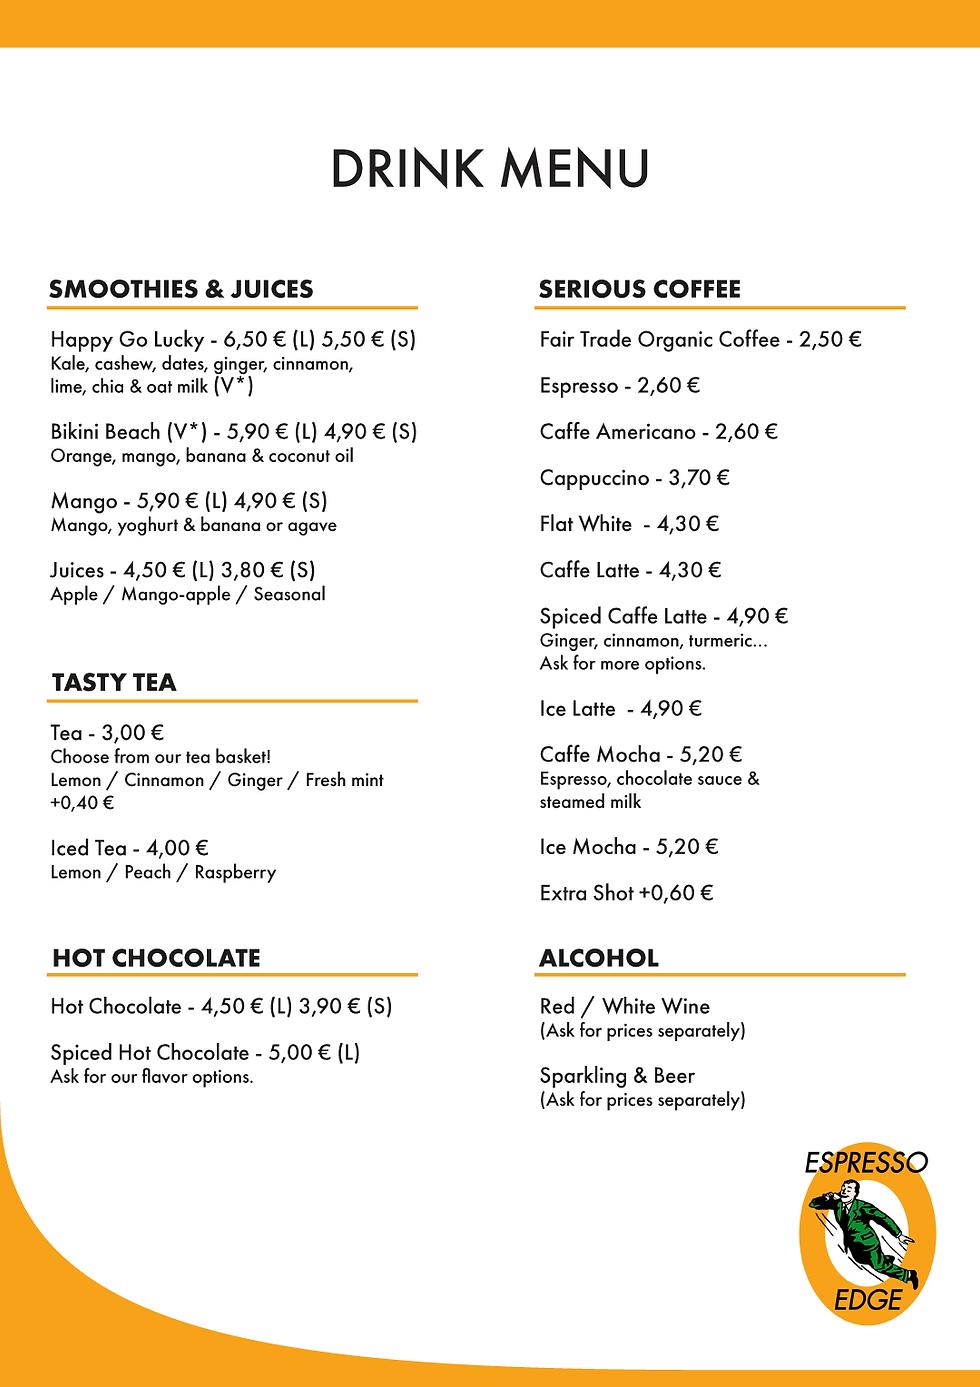 Espresso_edge_menu_drink.png